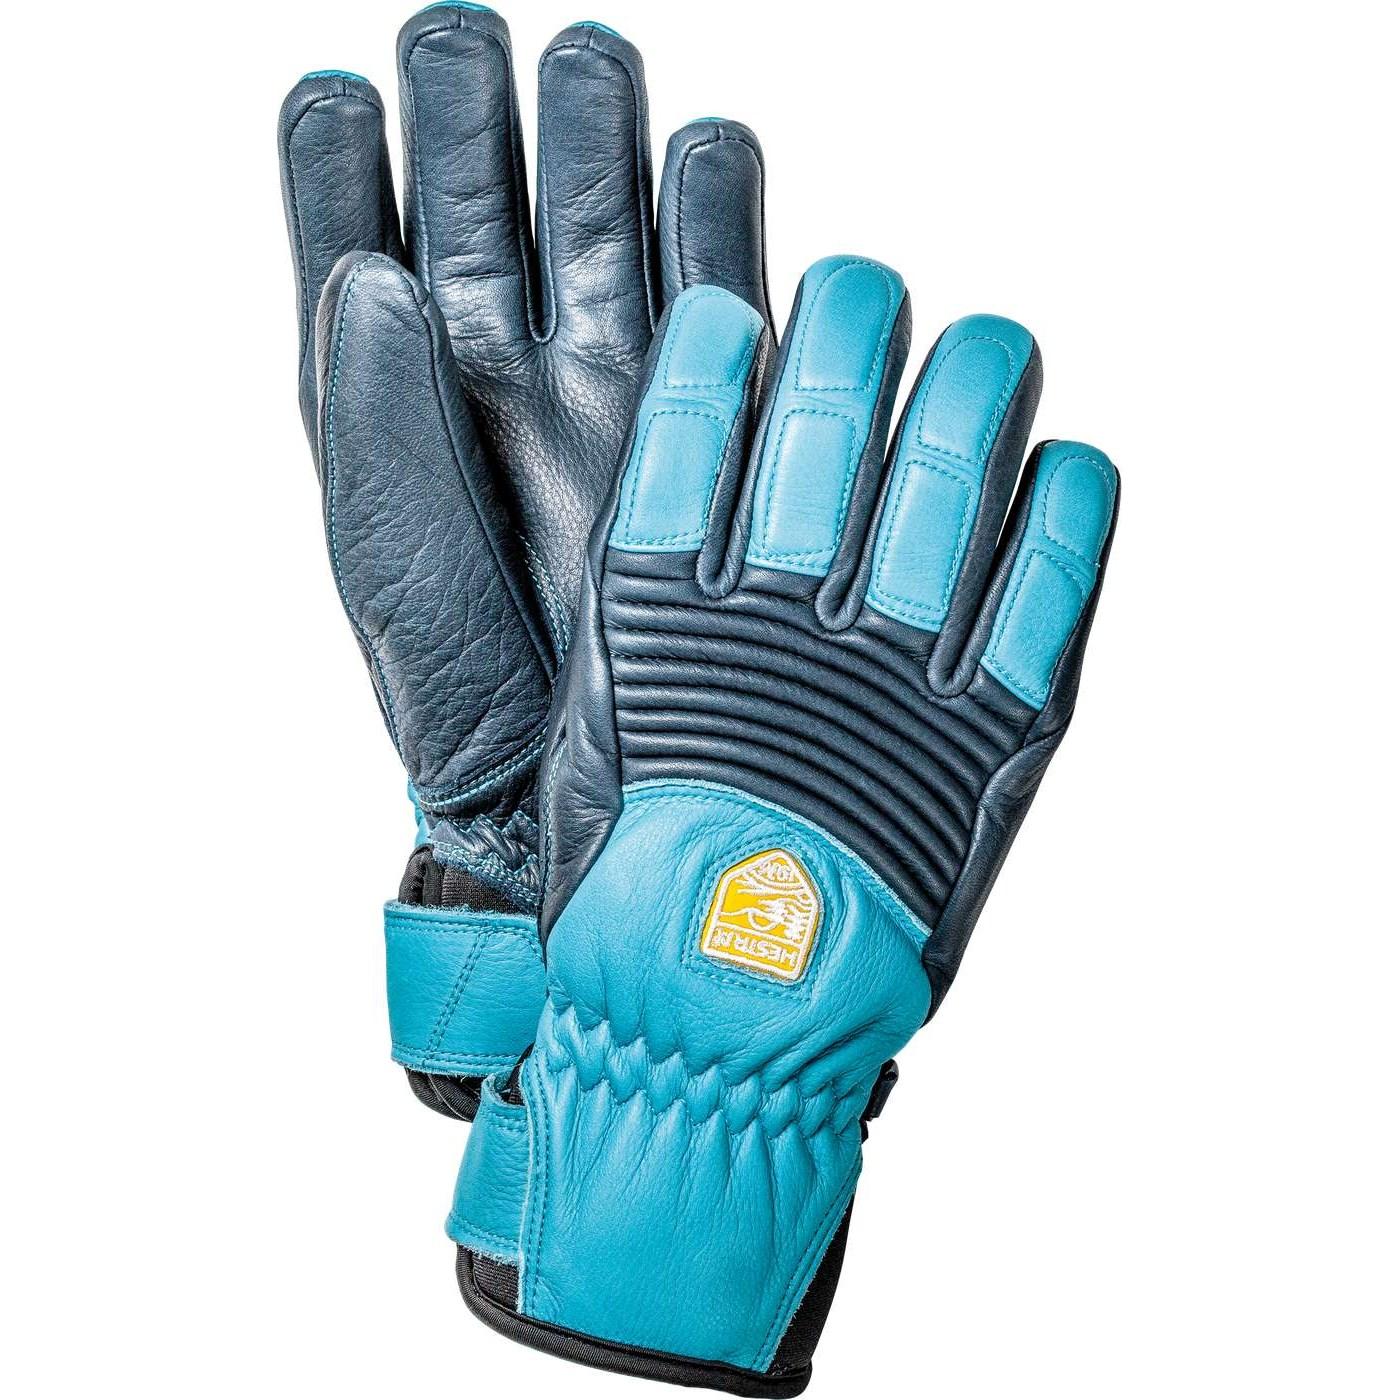 Womens leather ski gloves - Womens Leather Ski Gloves 20